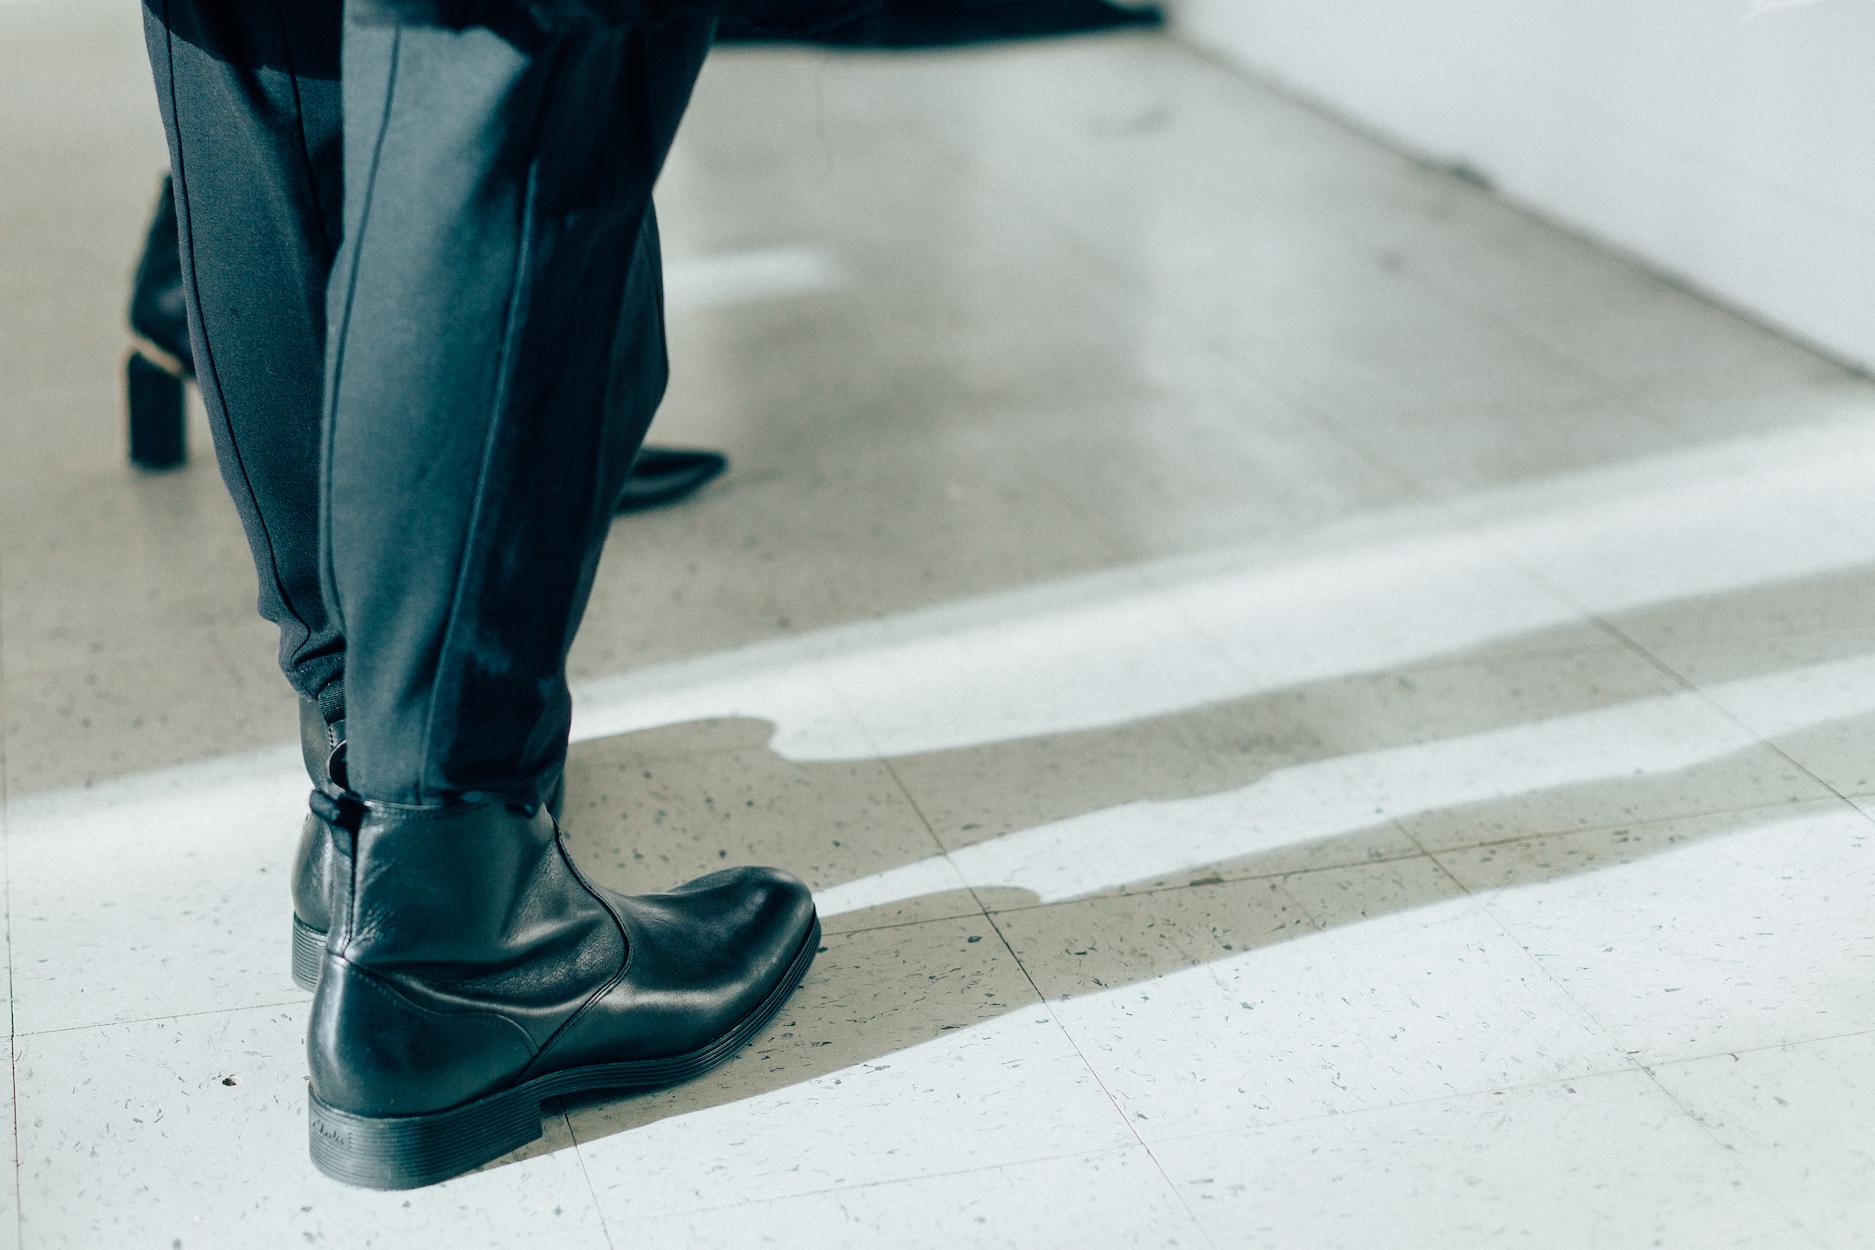 mybelonging-tommylei-menswear-streetstyle-clarks-shoes-chapter-clothing-showroomjoplin22.jpg